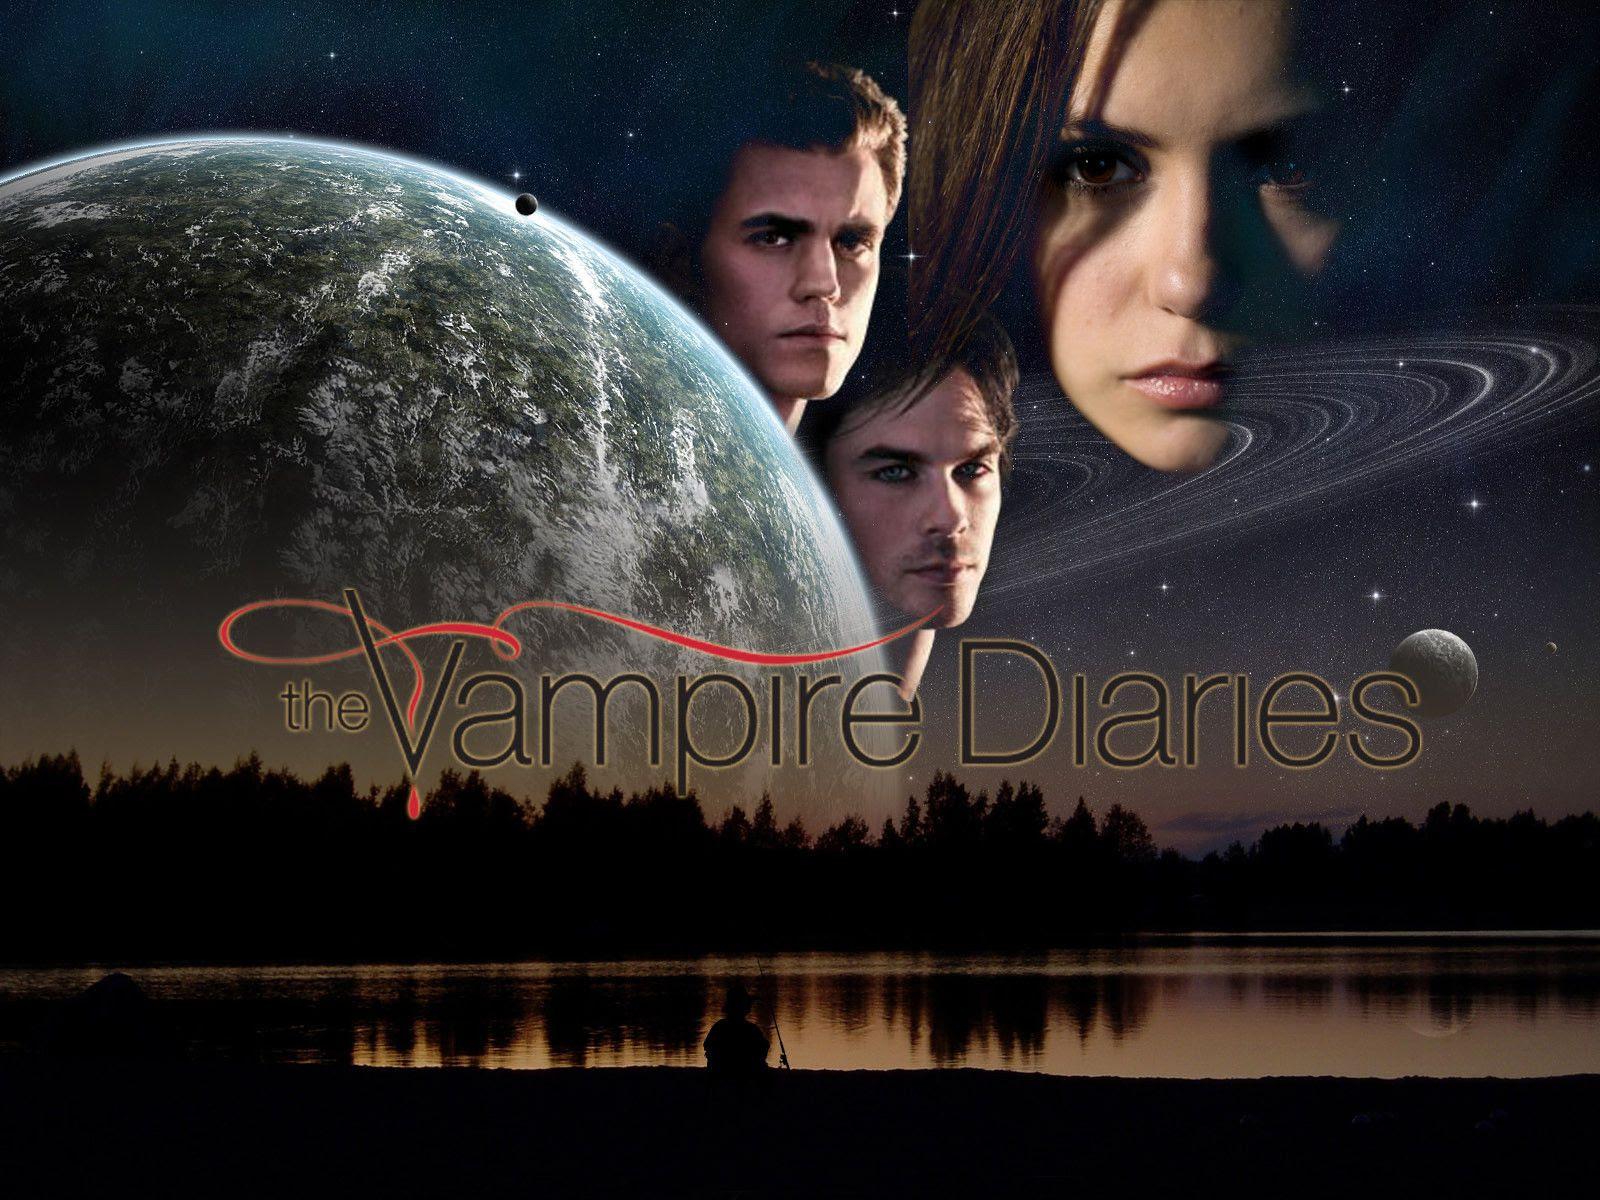 Vampire Diaries Iphone Wallpaper Iphone Wallpapers Pinterest 1600x1200